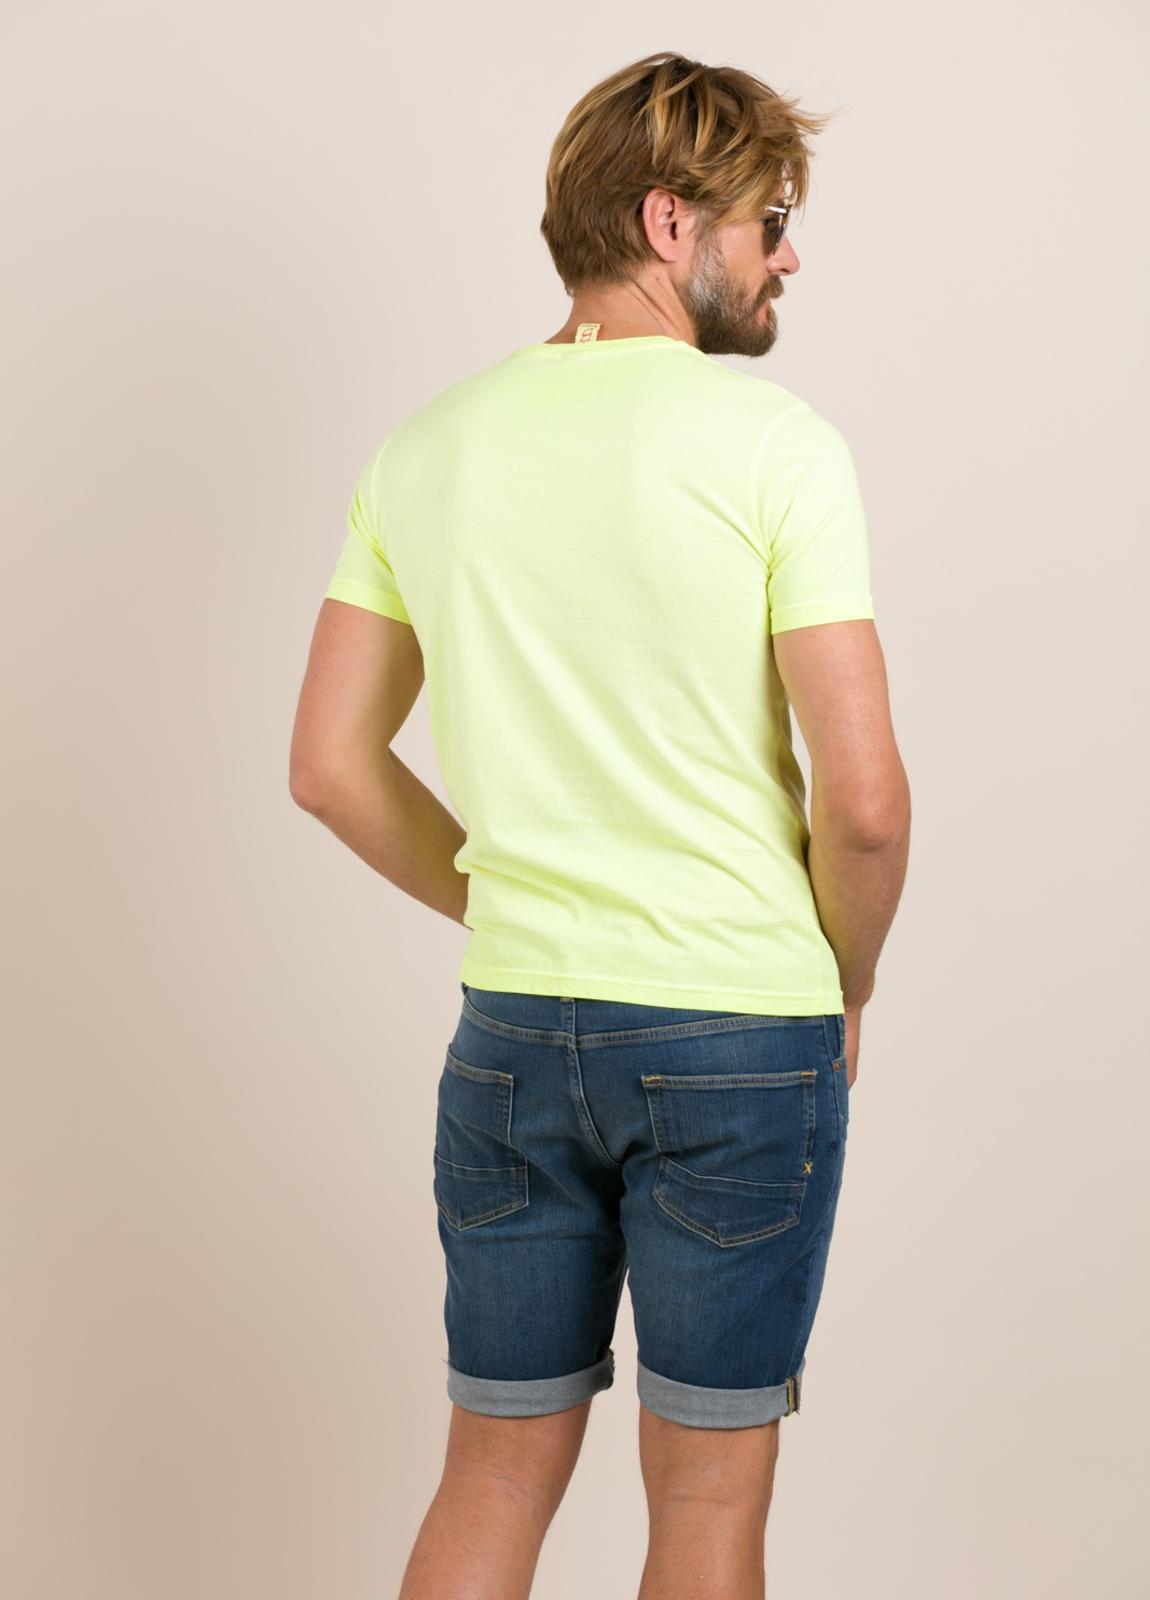 Camiseta BOB estampado vintage lima - Ítem1